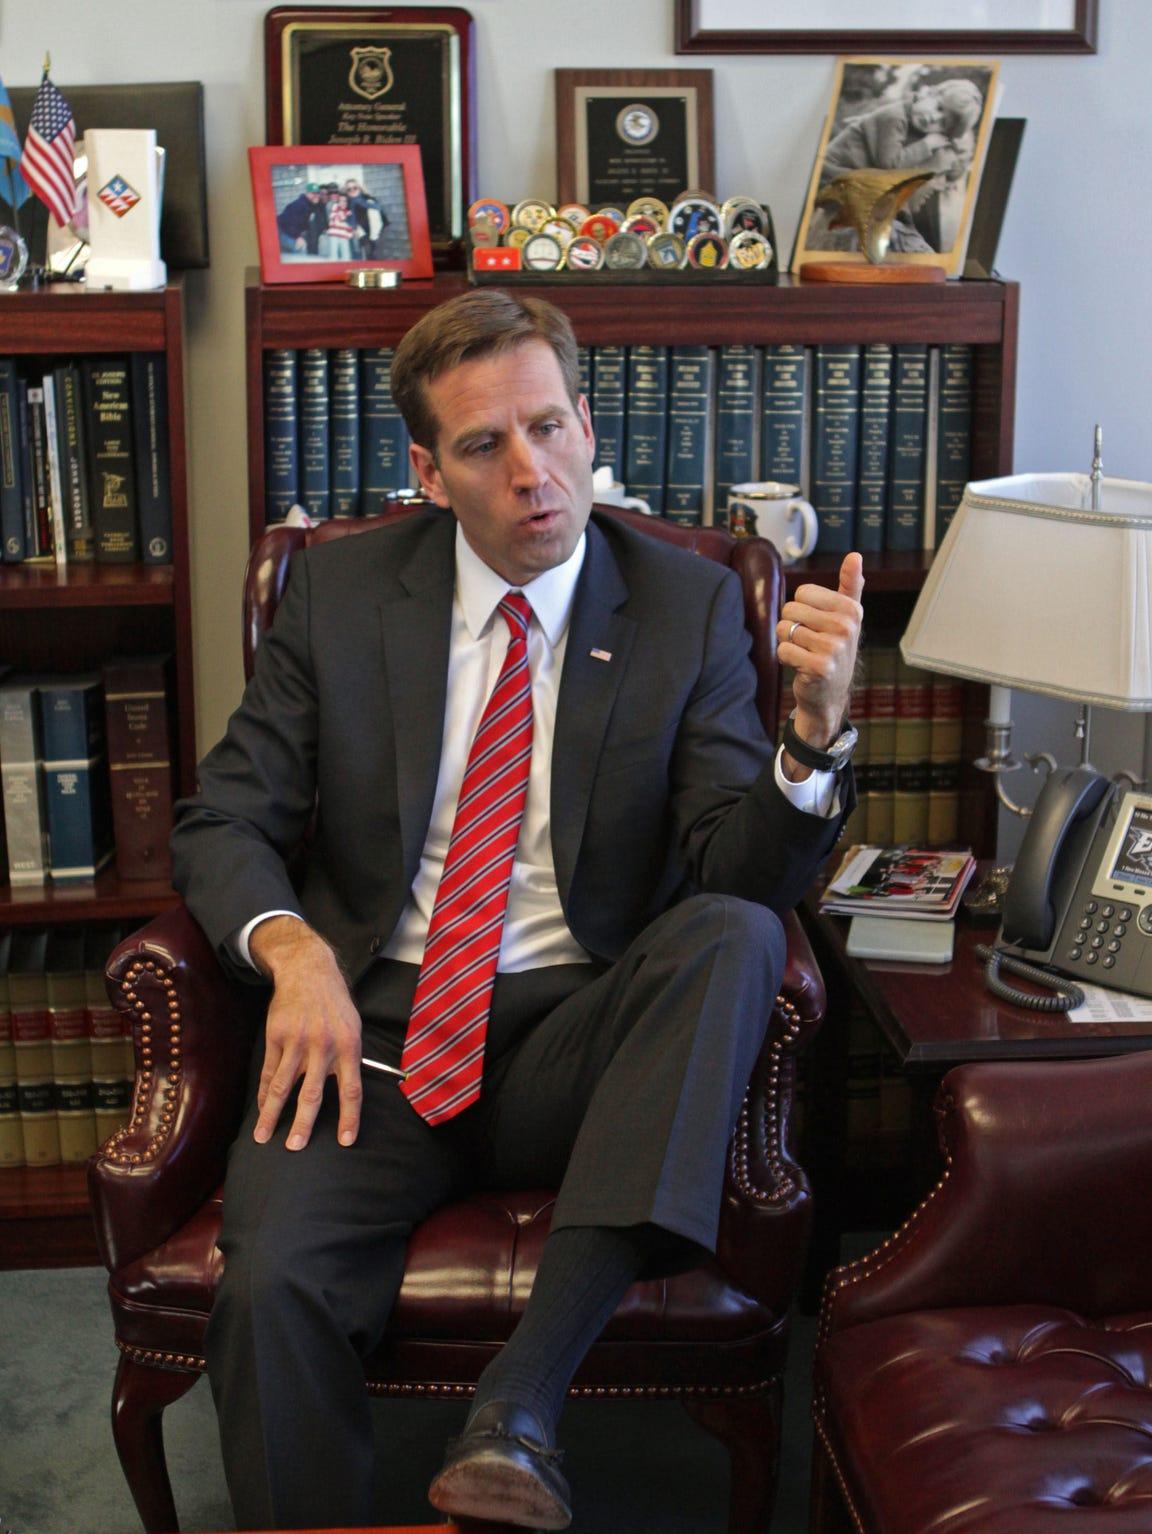 Then-Delaware Attorney General Beau Biden